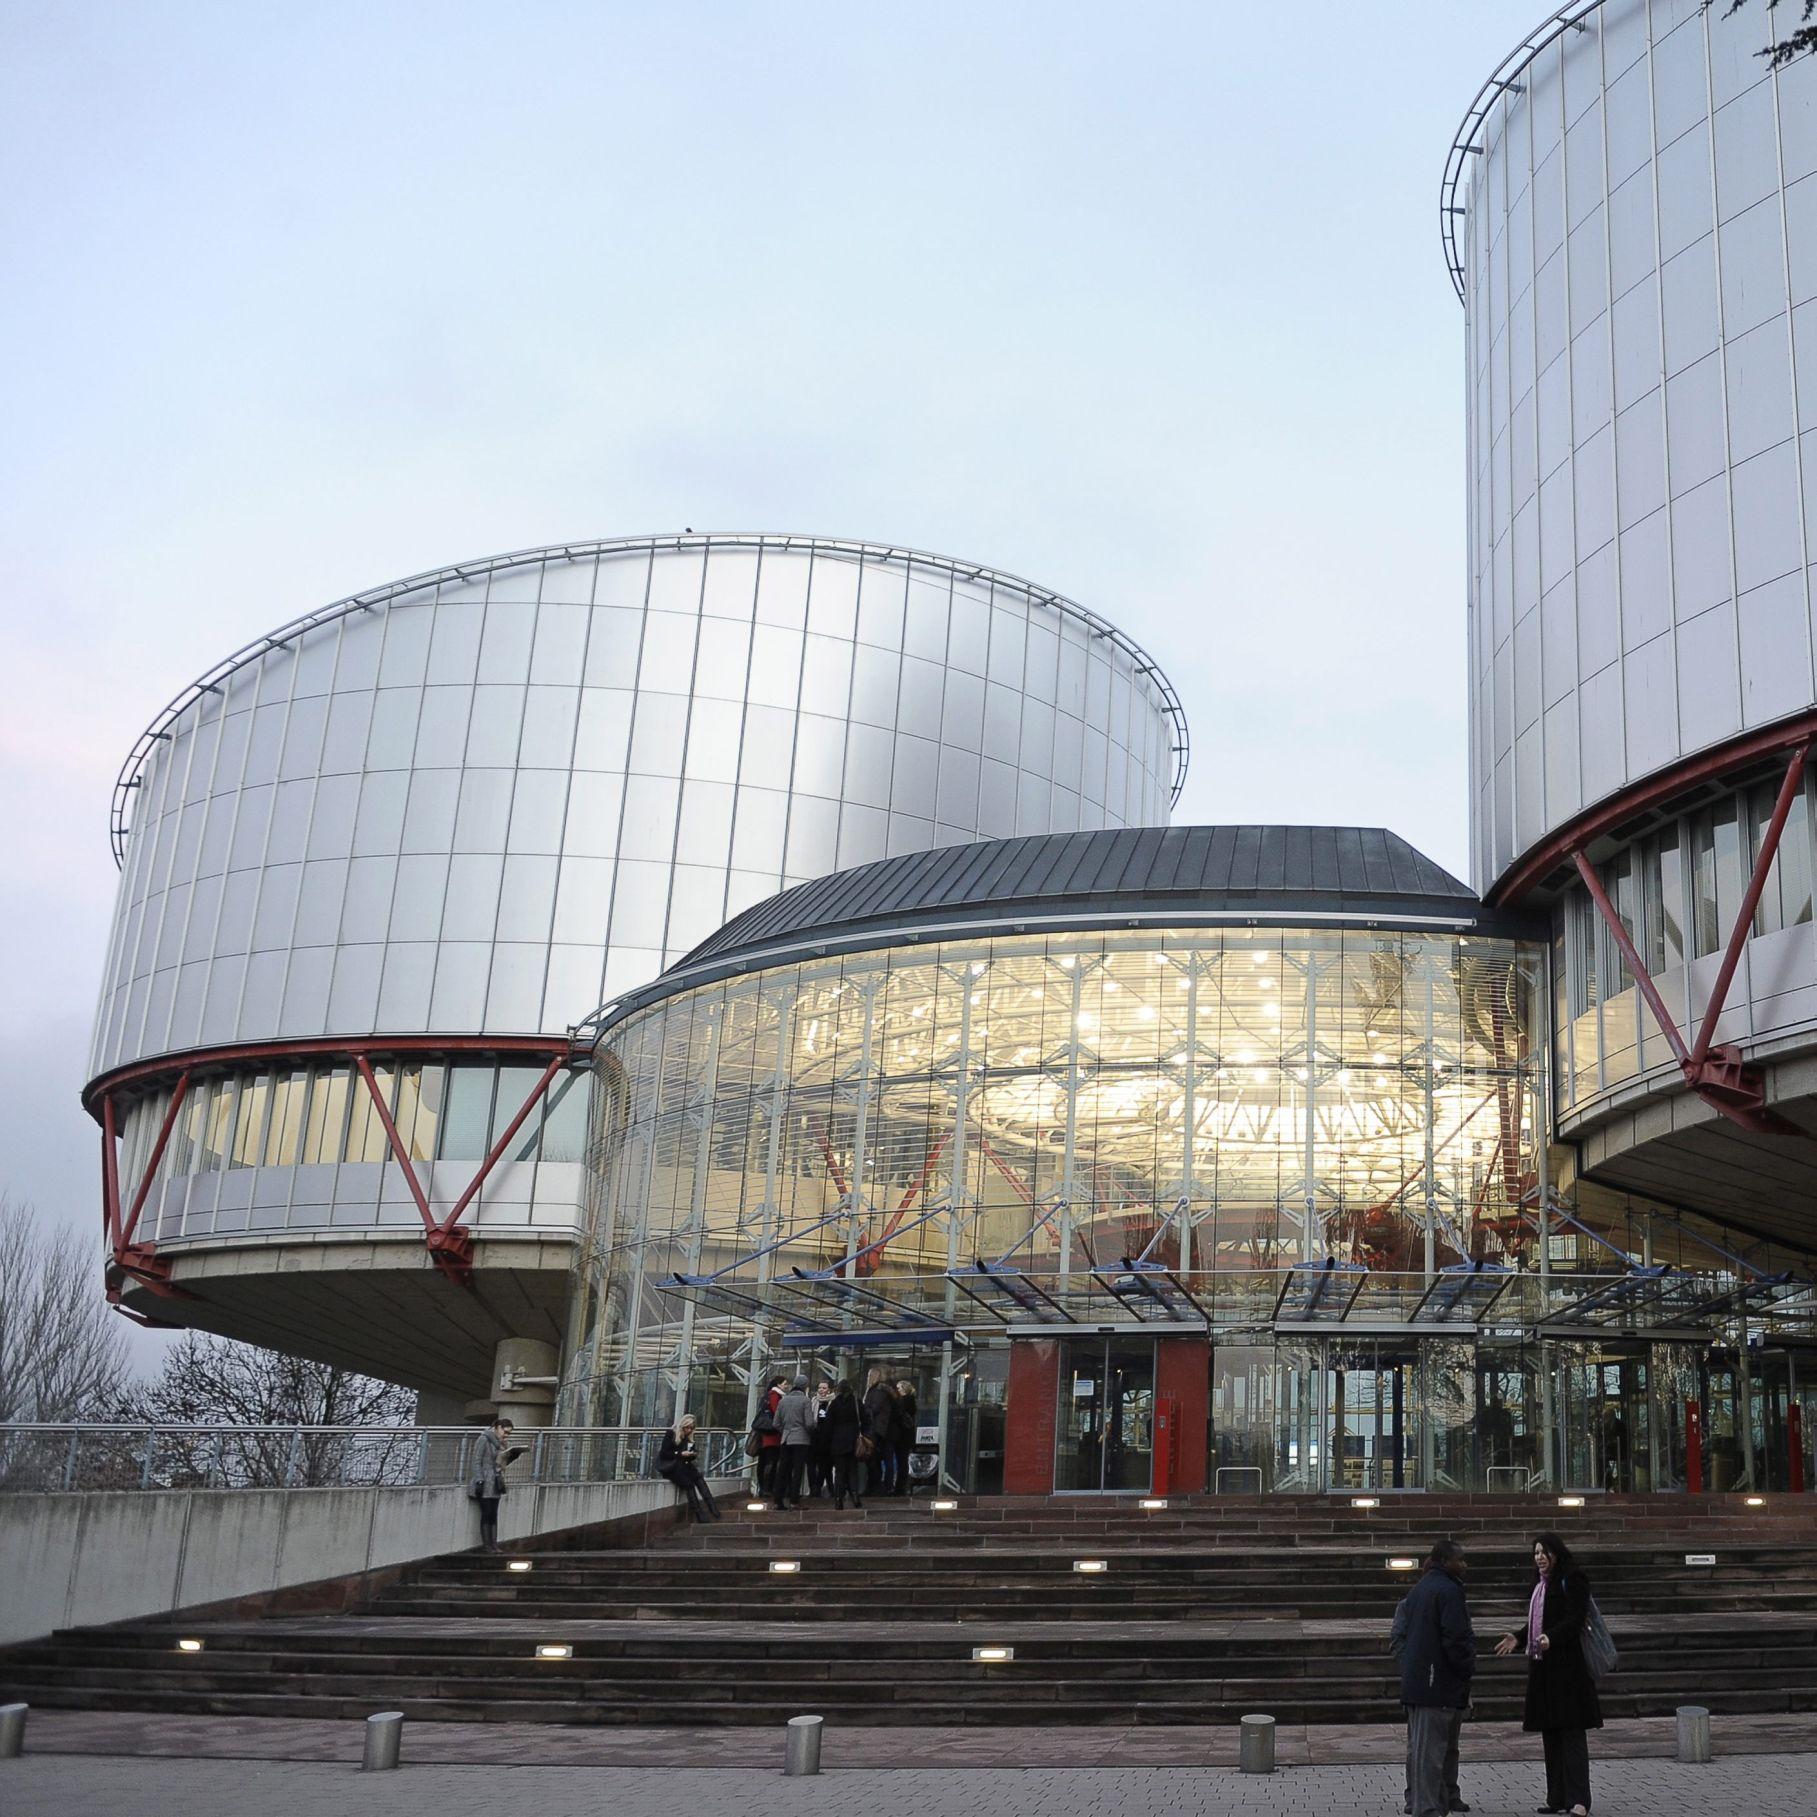 ОМО-Илинден отново осъди България в Страсбург